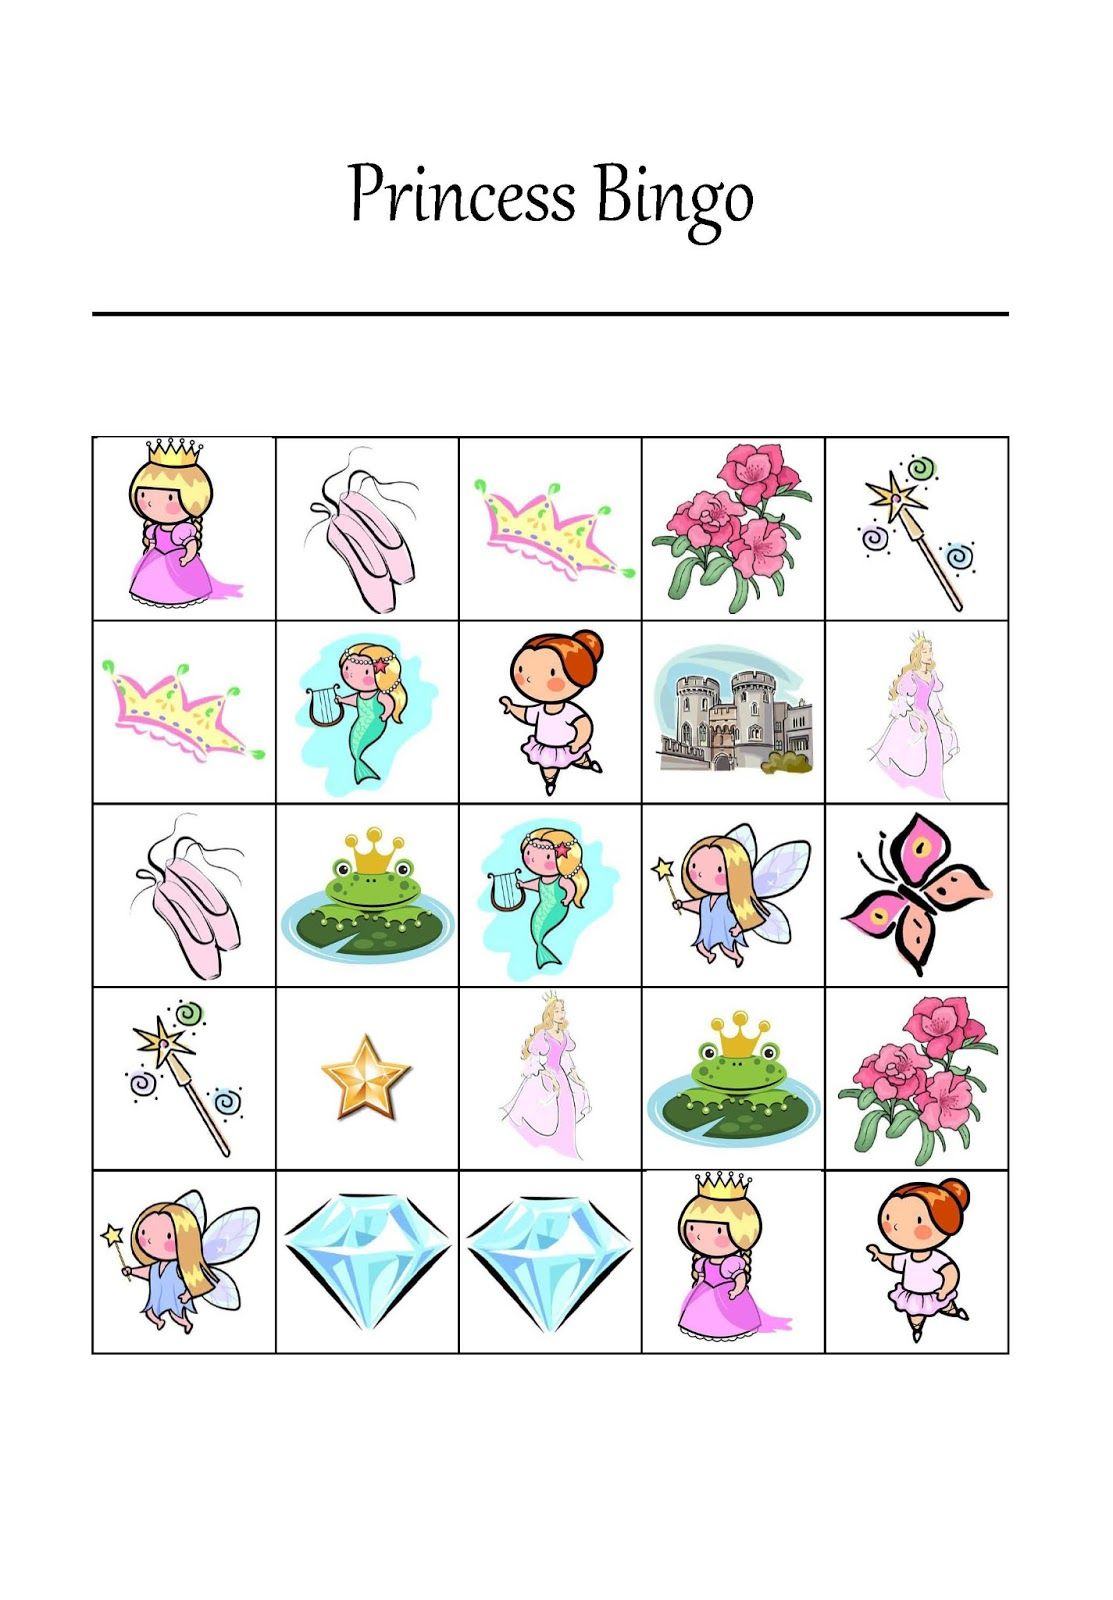 Prinsessen Bingo | Prinsessenfeest, Kinderfeestje, Prinsessen